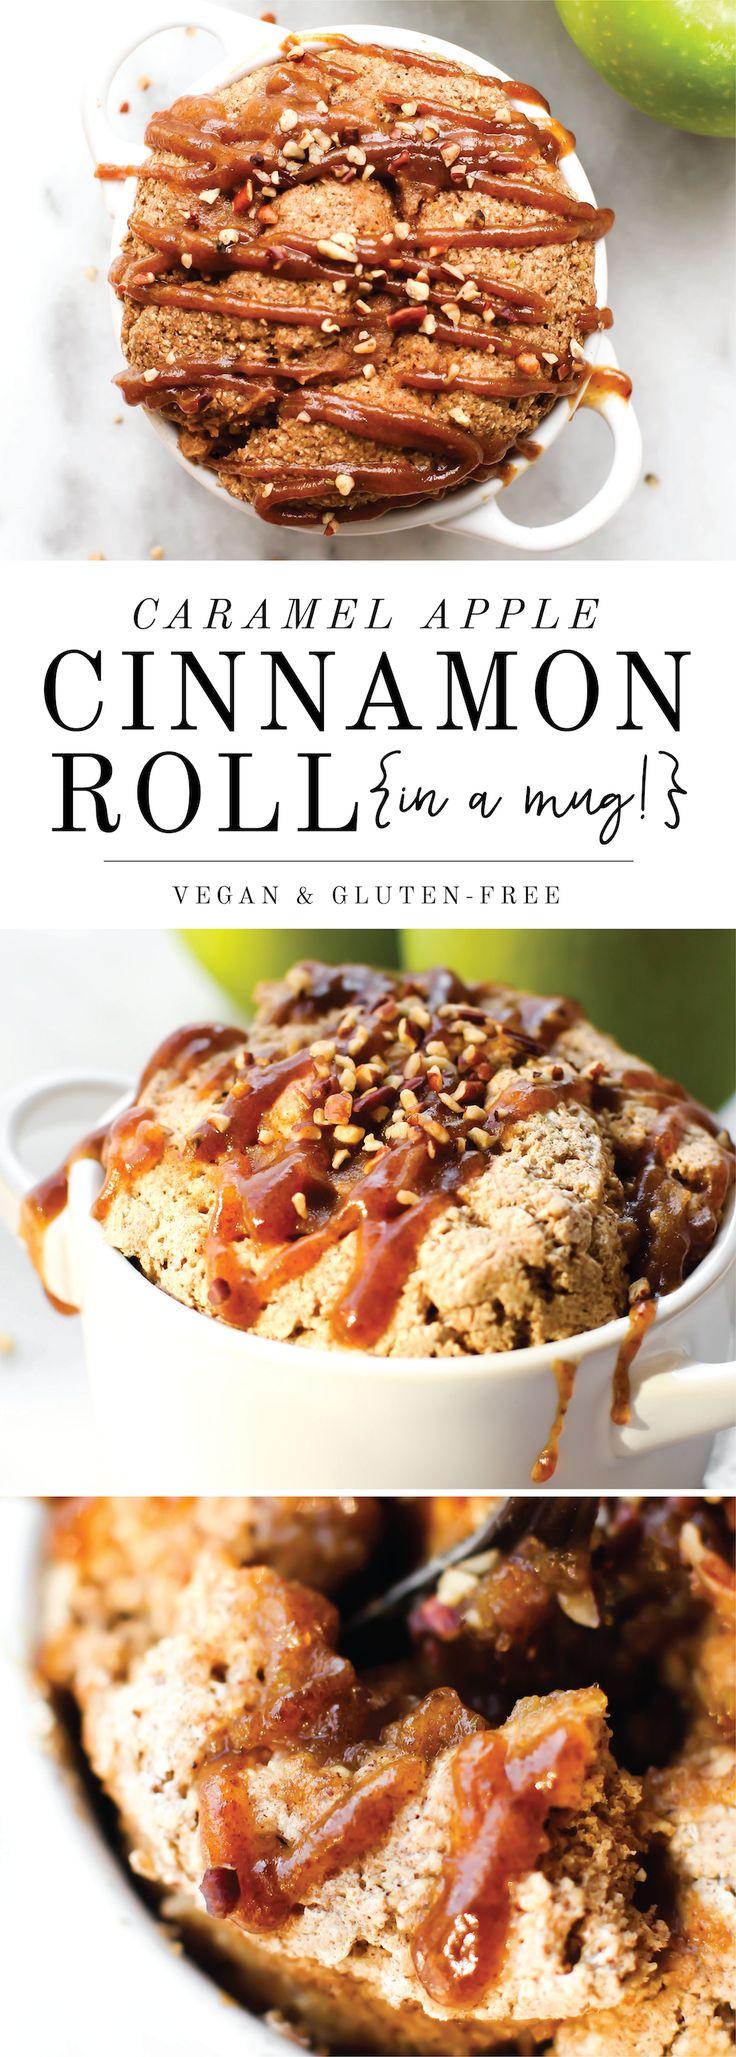 Caramel Apple Cinnamon Roll Mug Cake | Vegan, Gluten-Free, Oil-Free